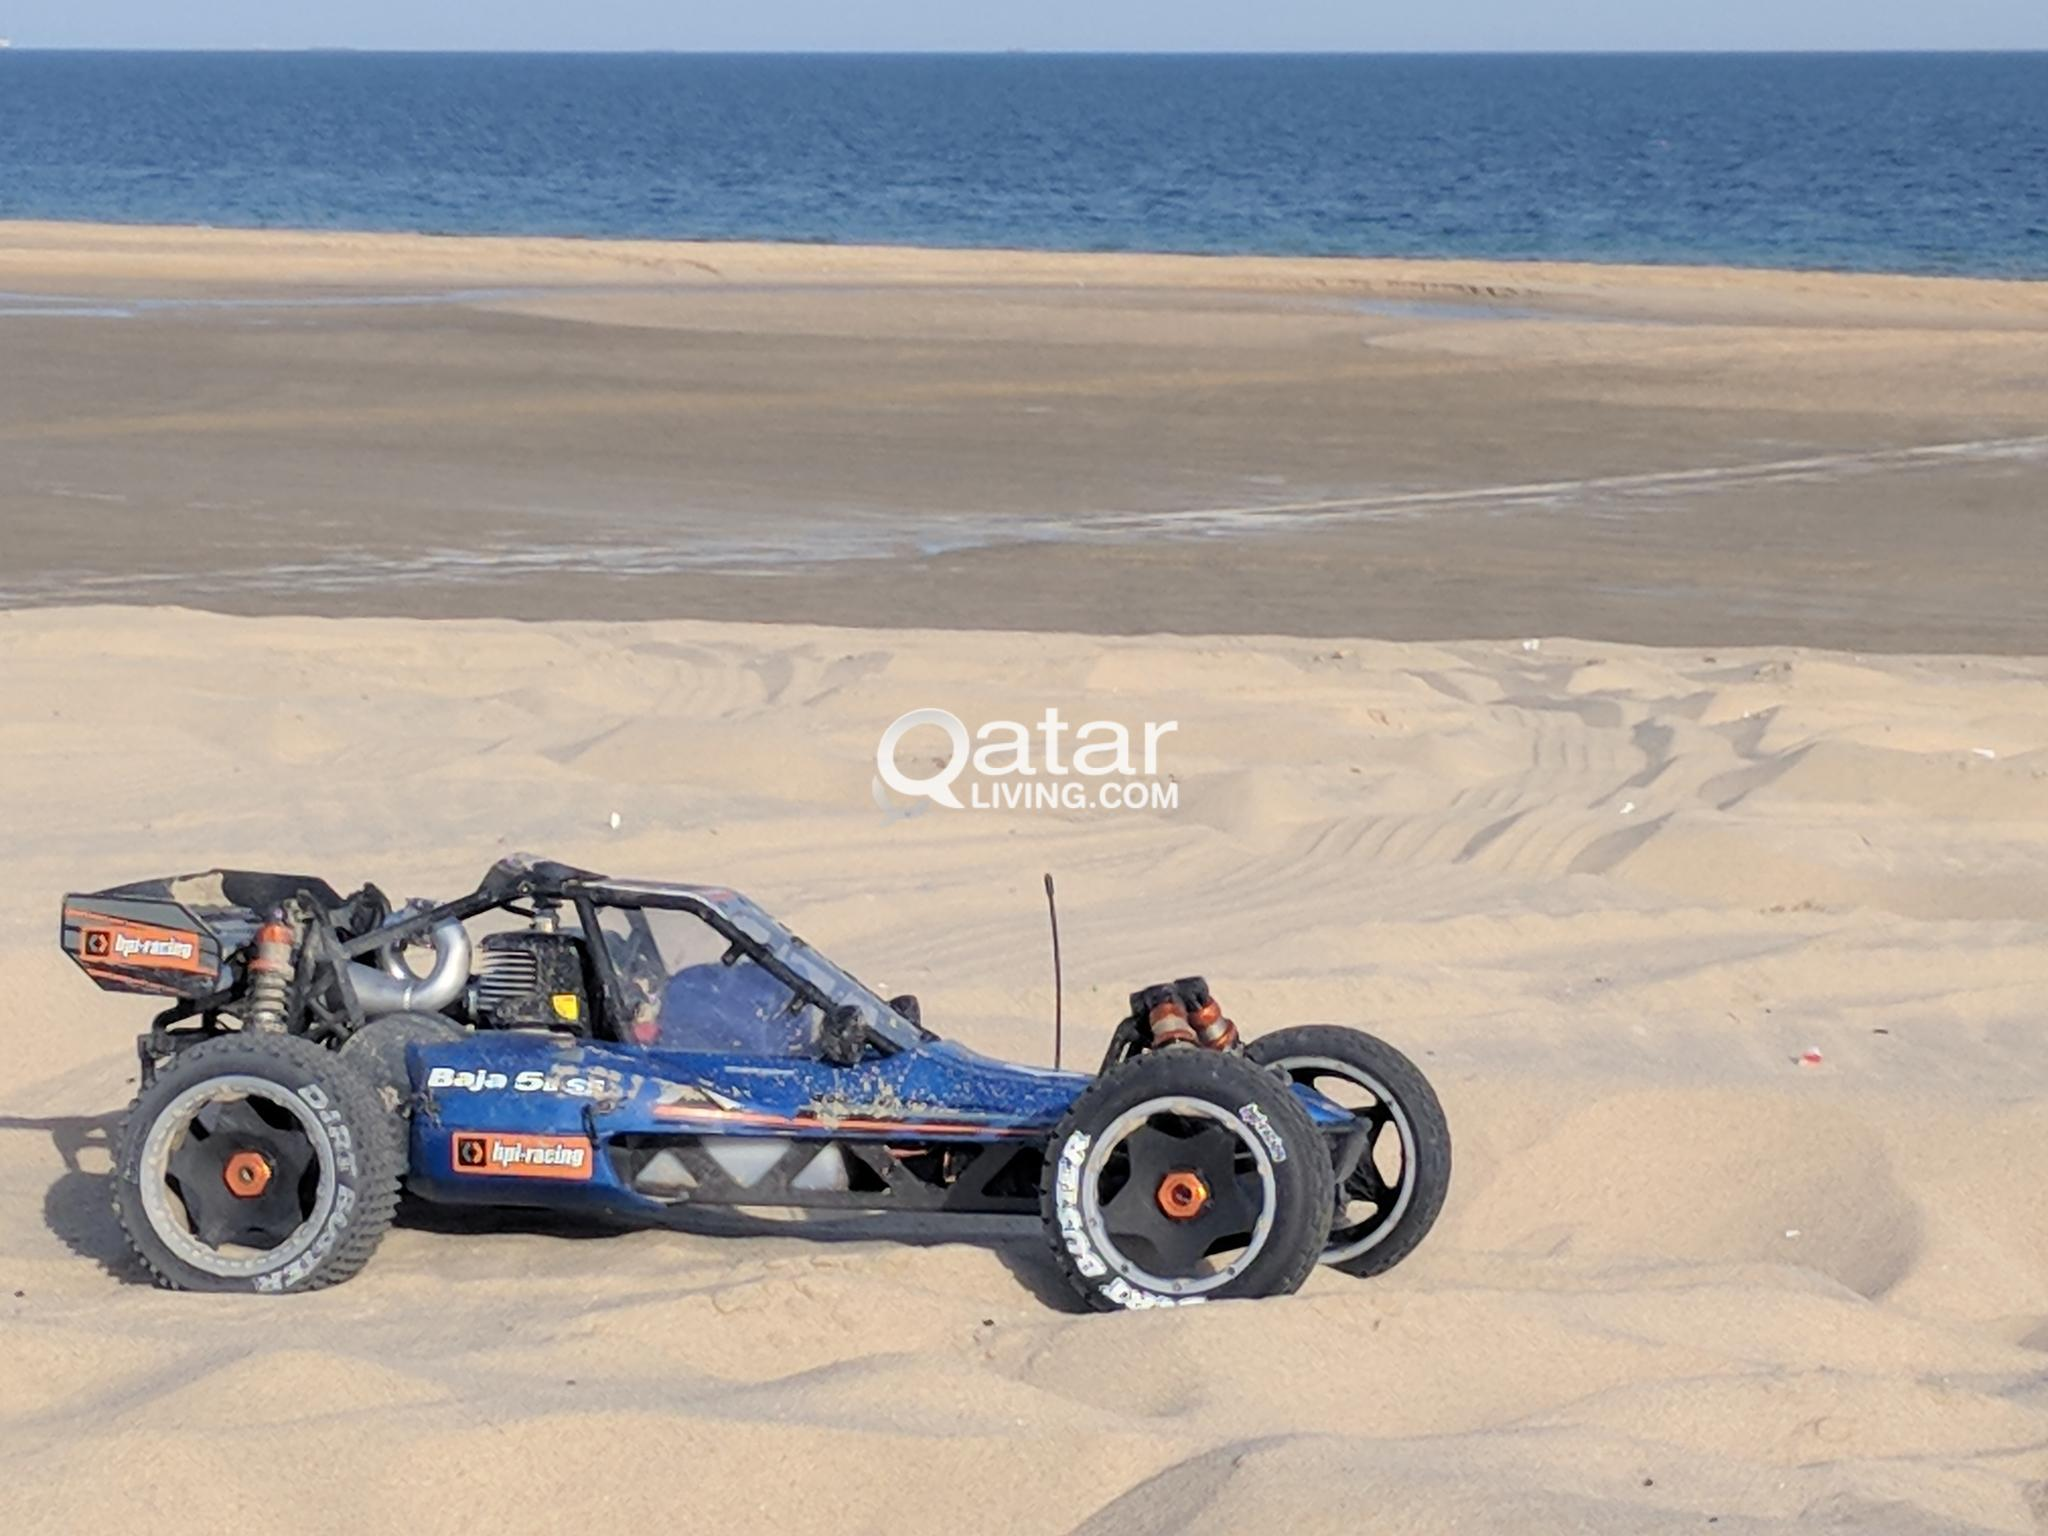 Genuine HPI Baja 5B SS kit version + upgrades | Qatar Living